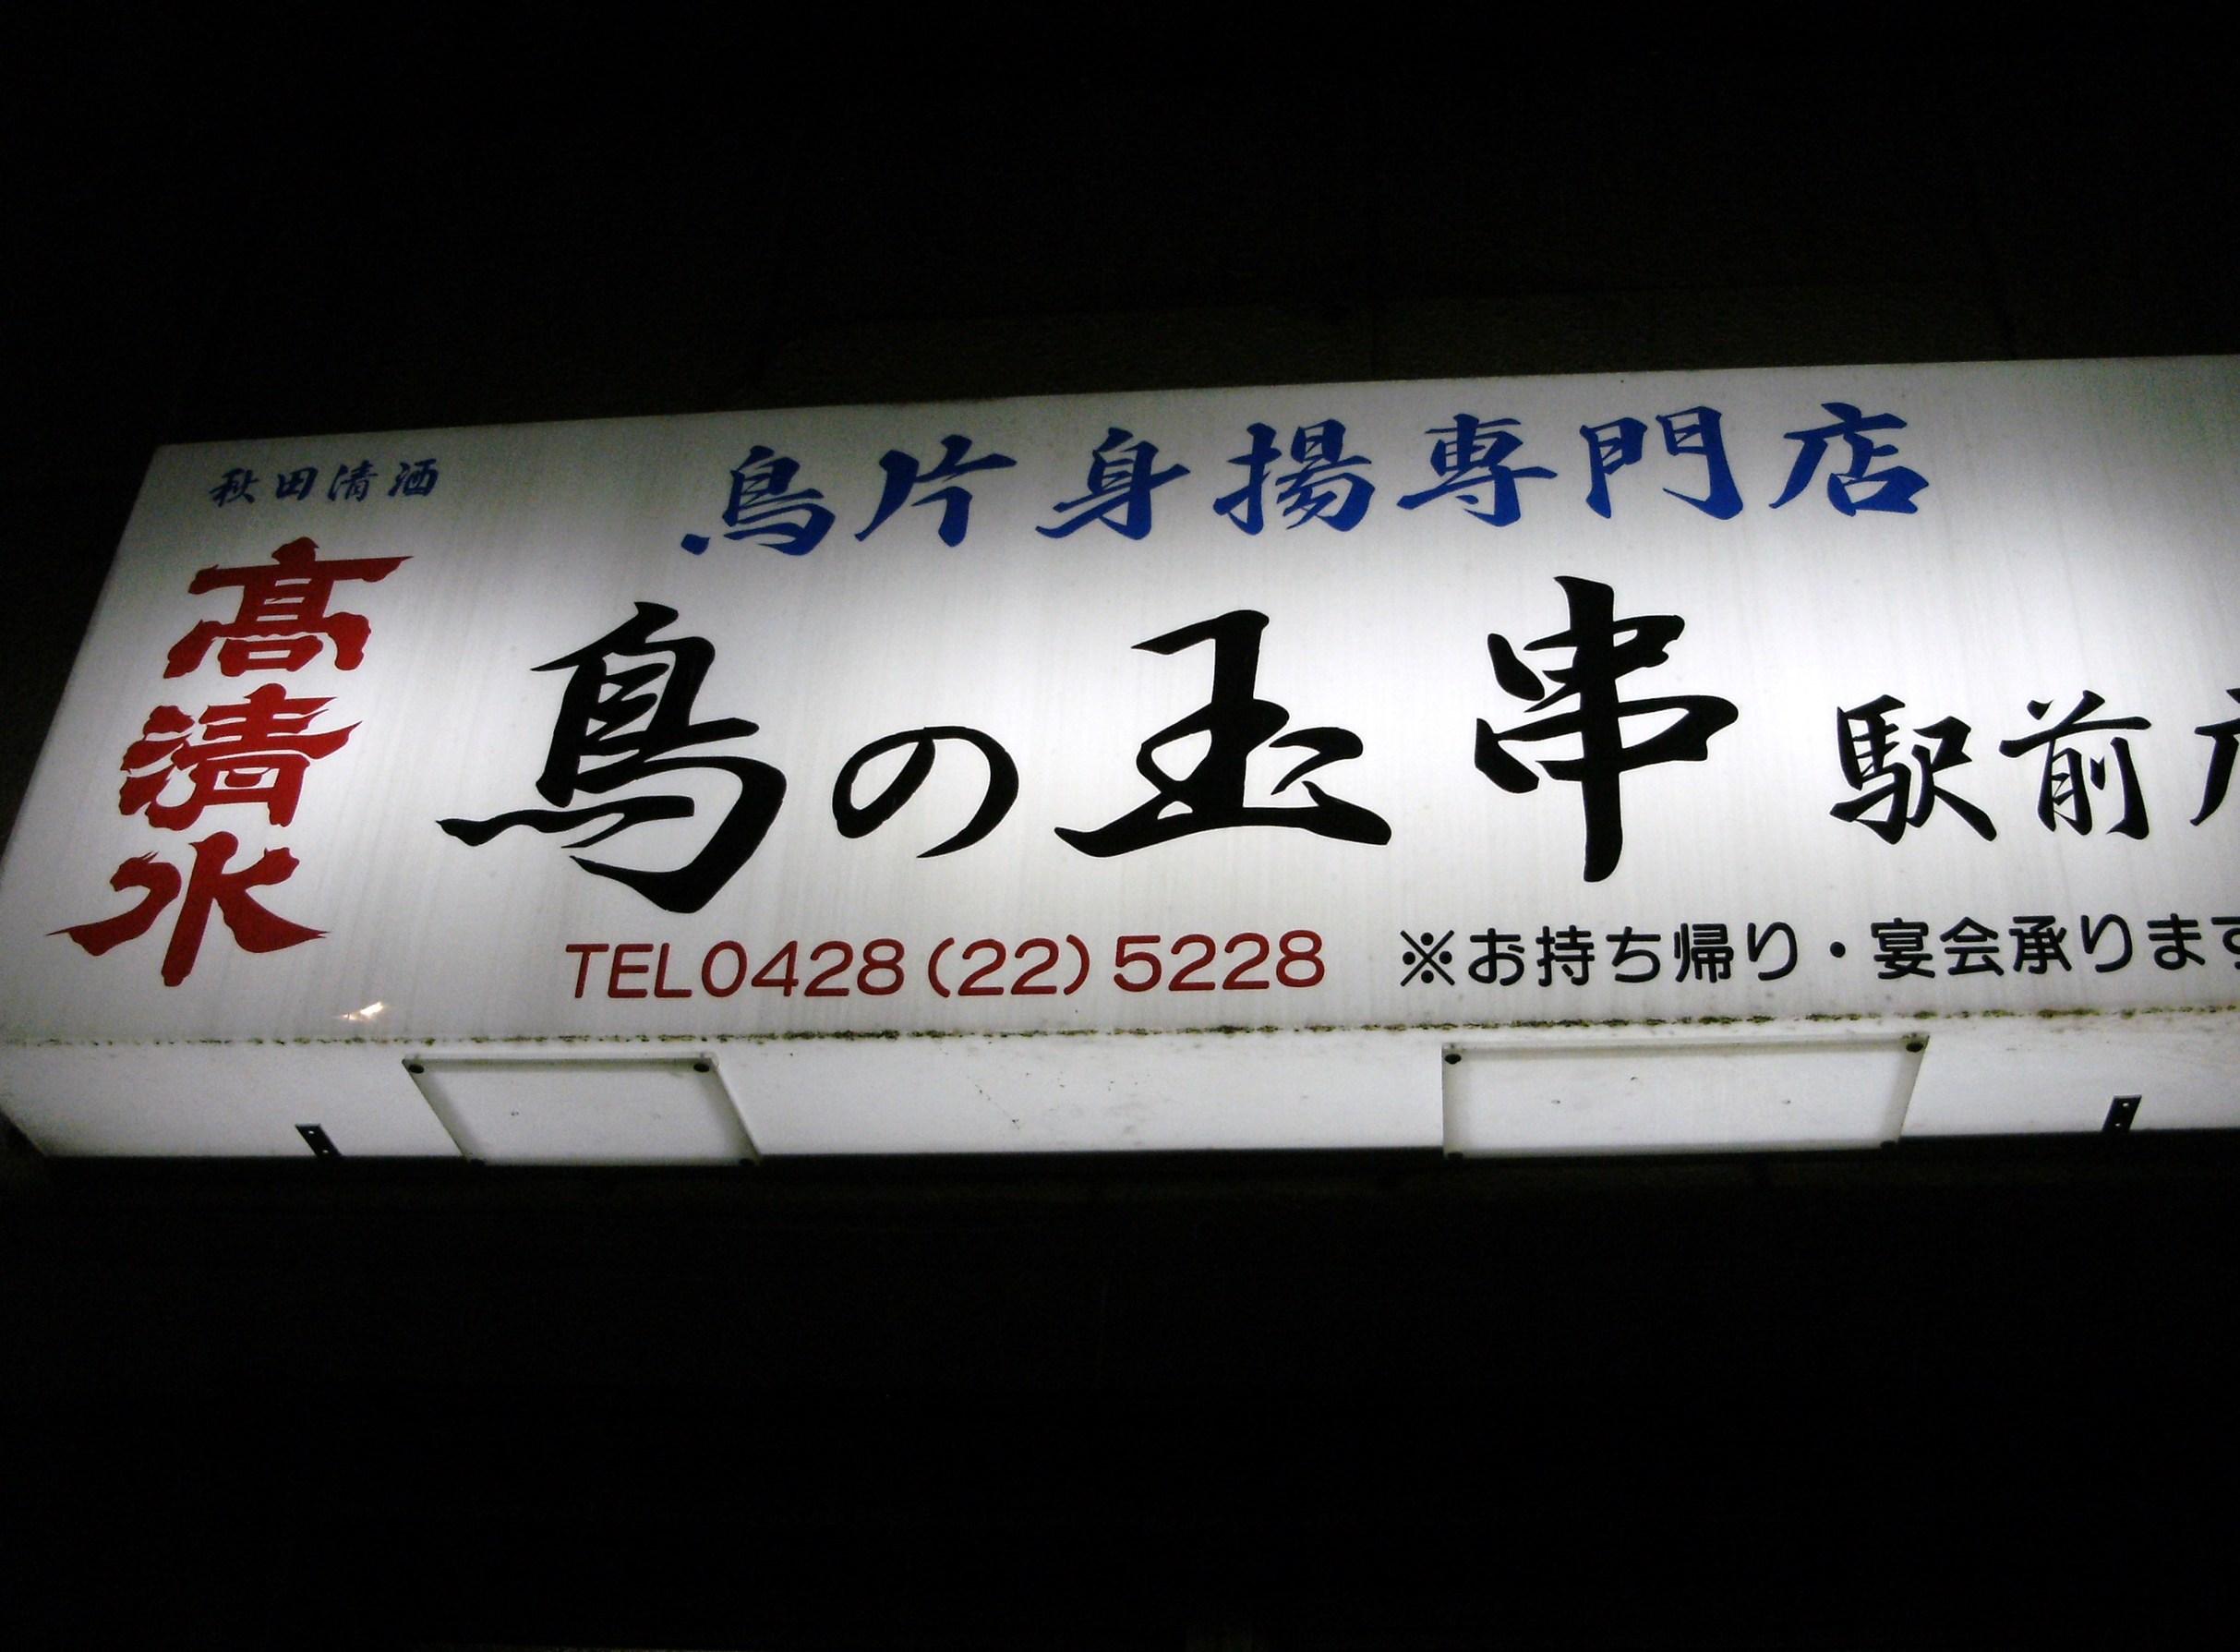 鳥の玉串 駅前店